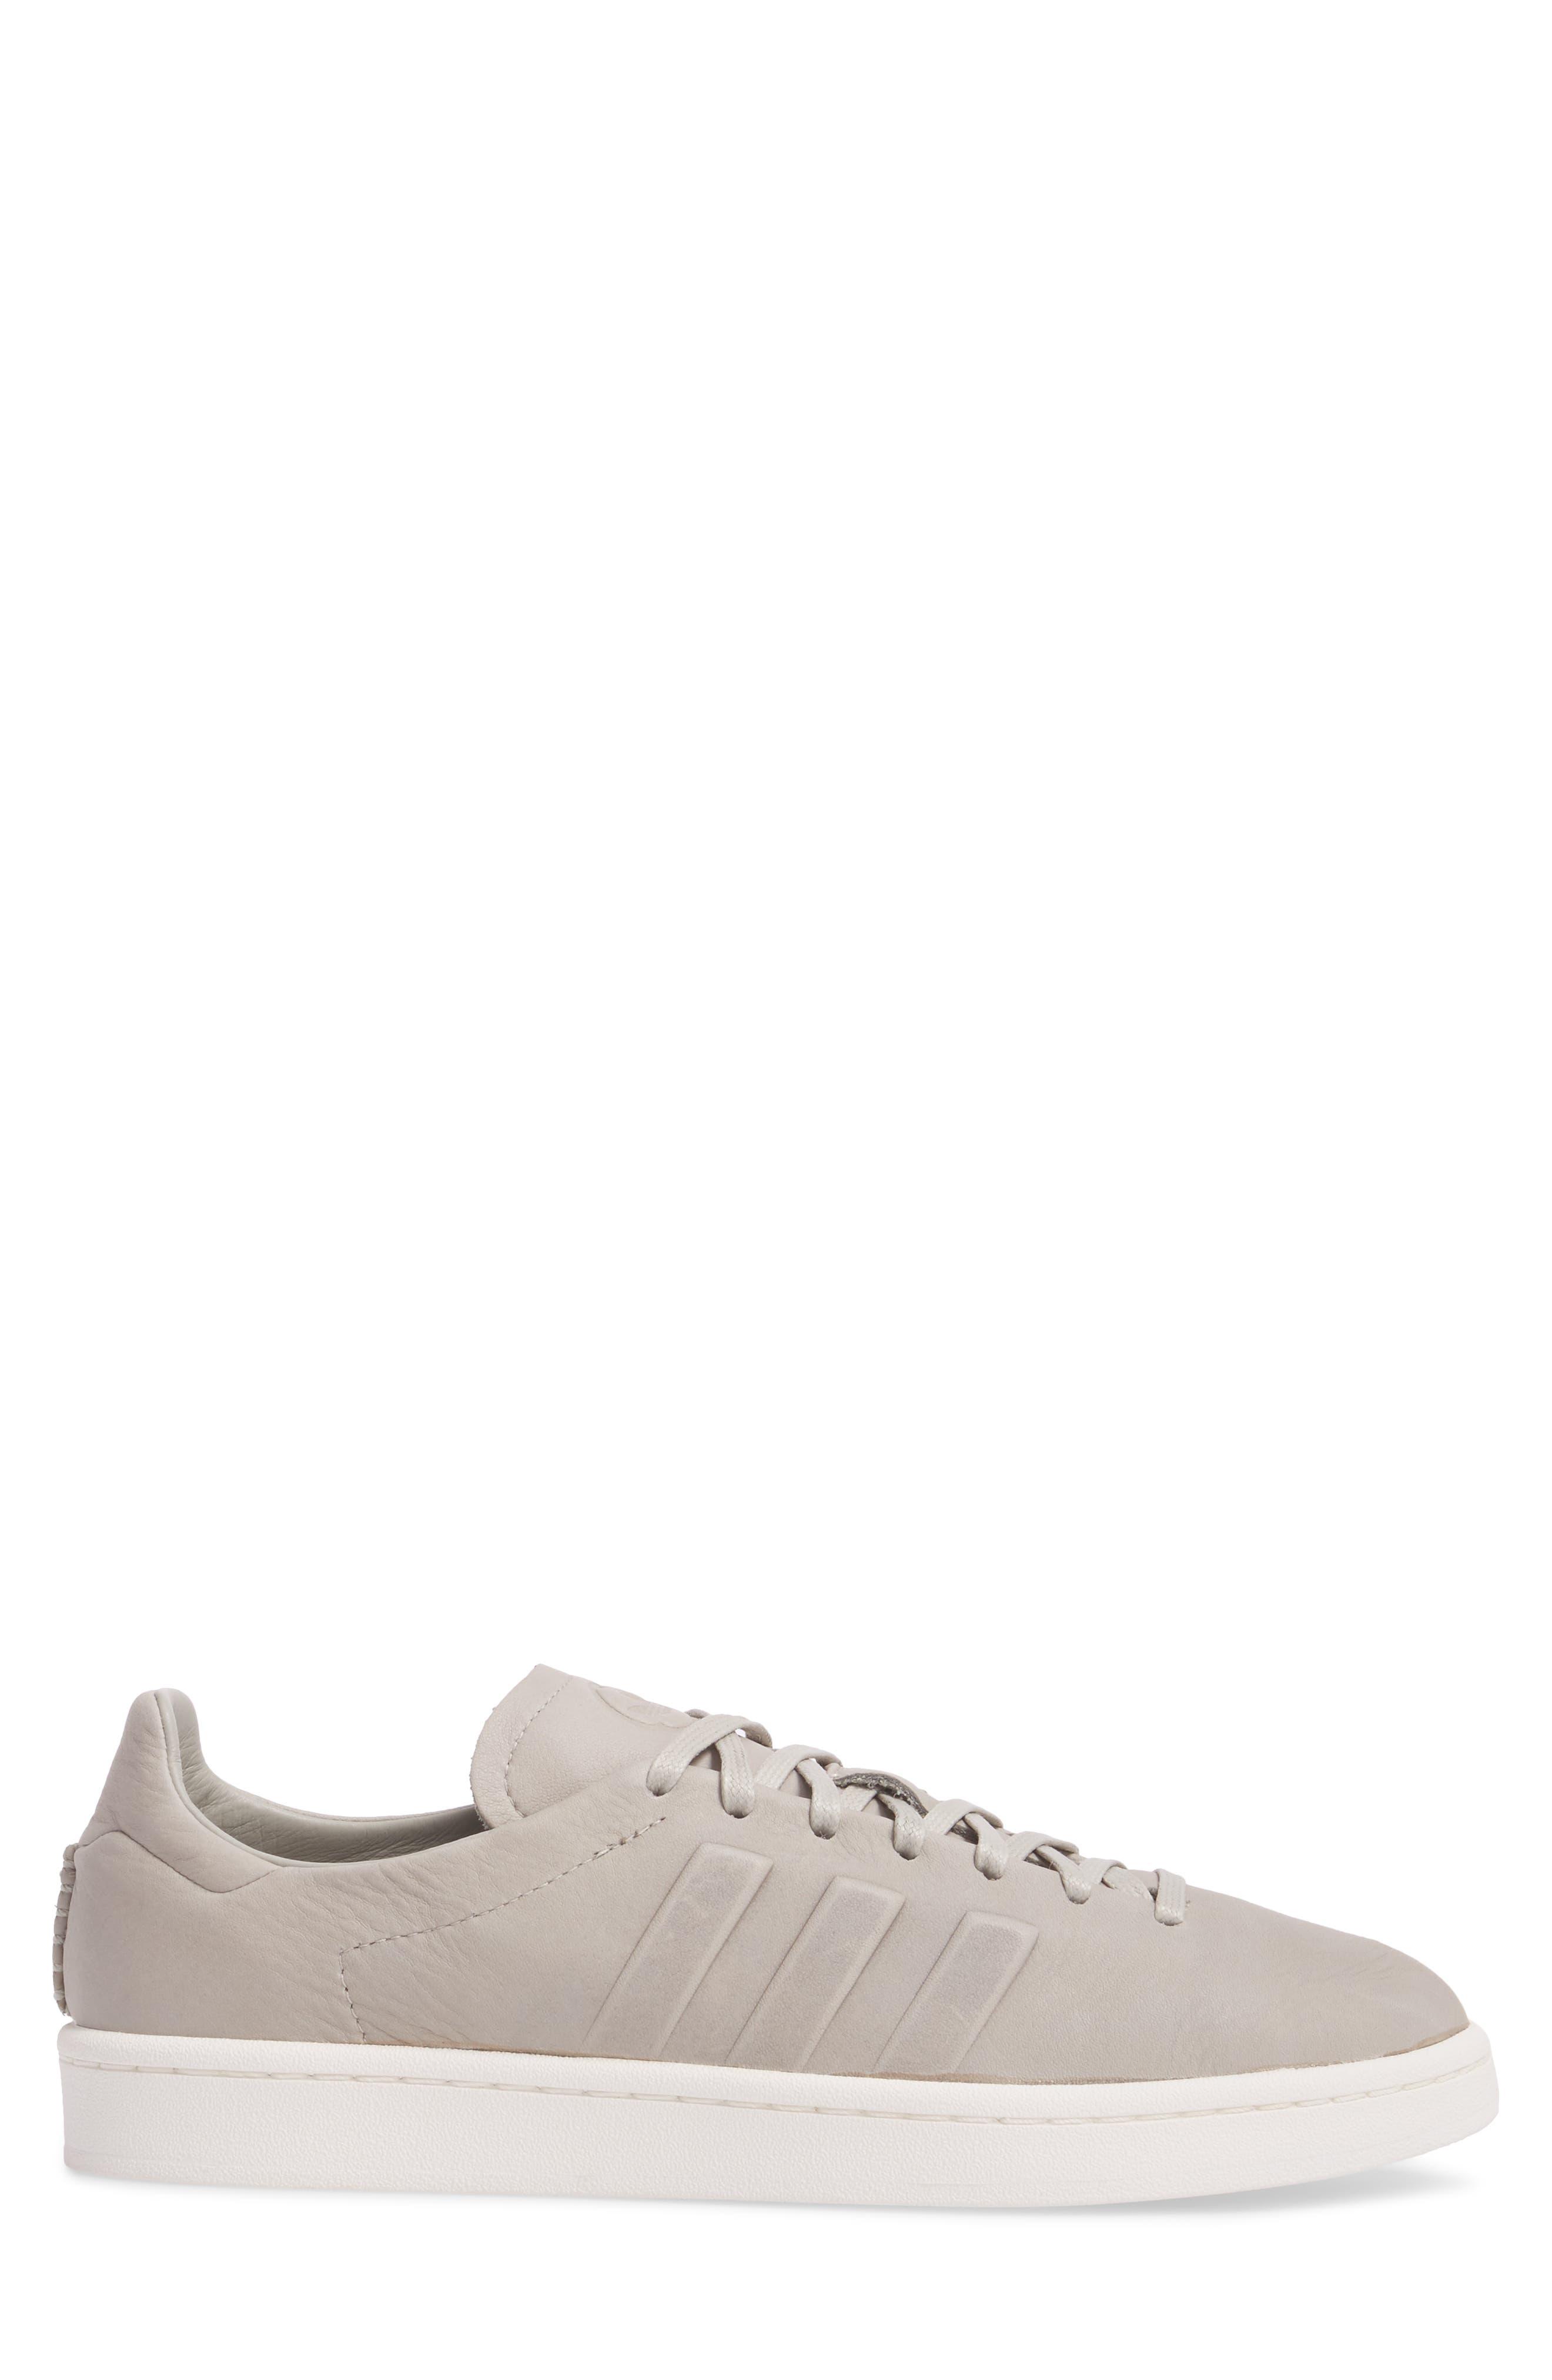 Low Top Sneaker,                             Alternate thumbnail 3, color,                             Sesame/ Chalk White